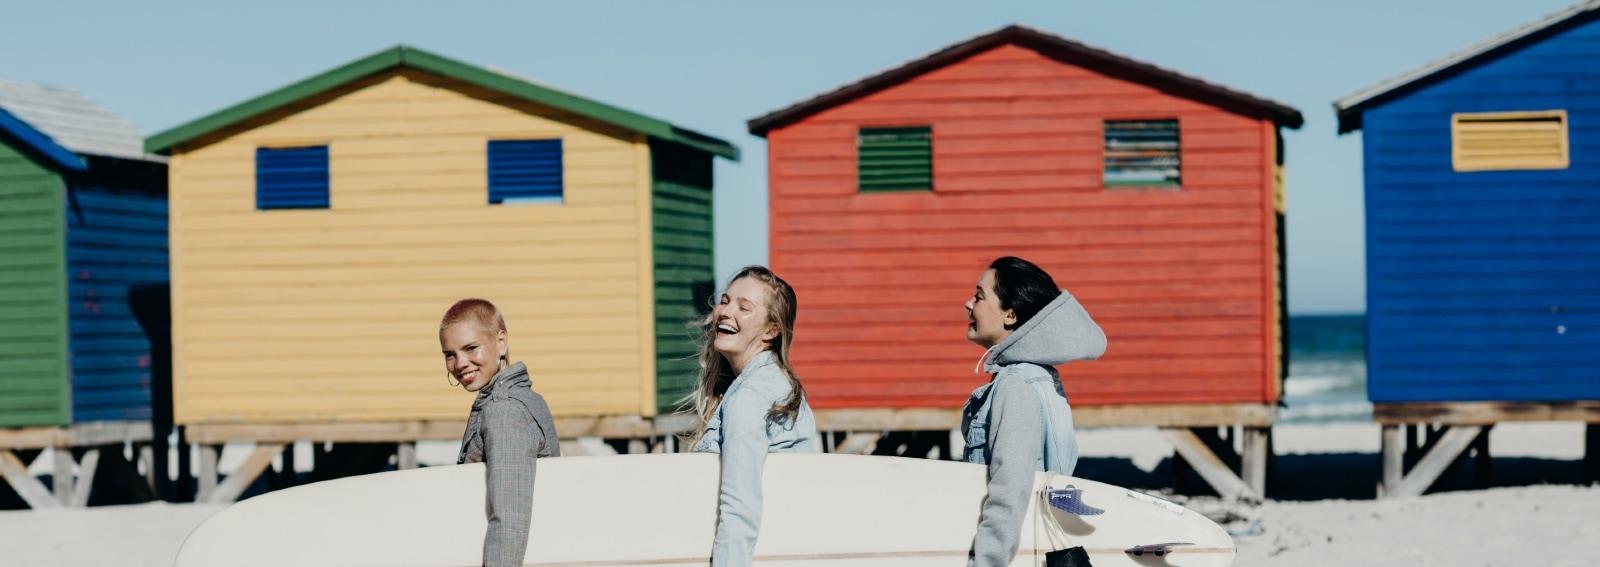 GettyImages-ragazze amiche estate